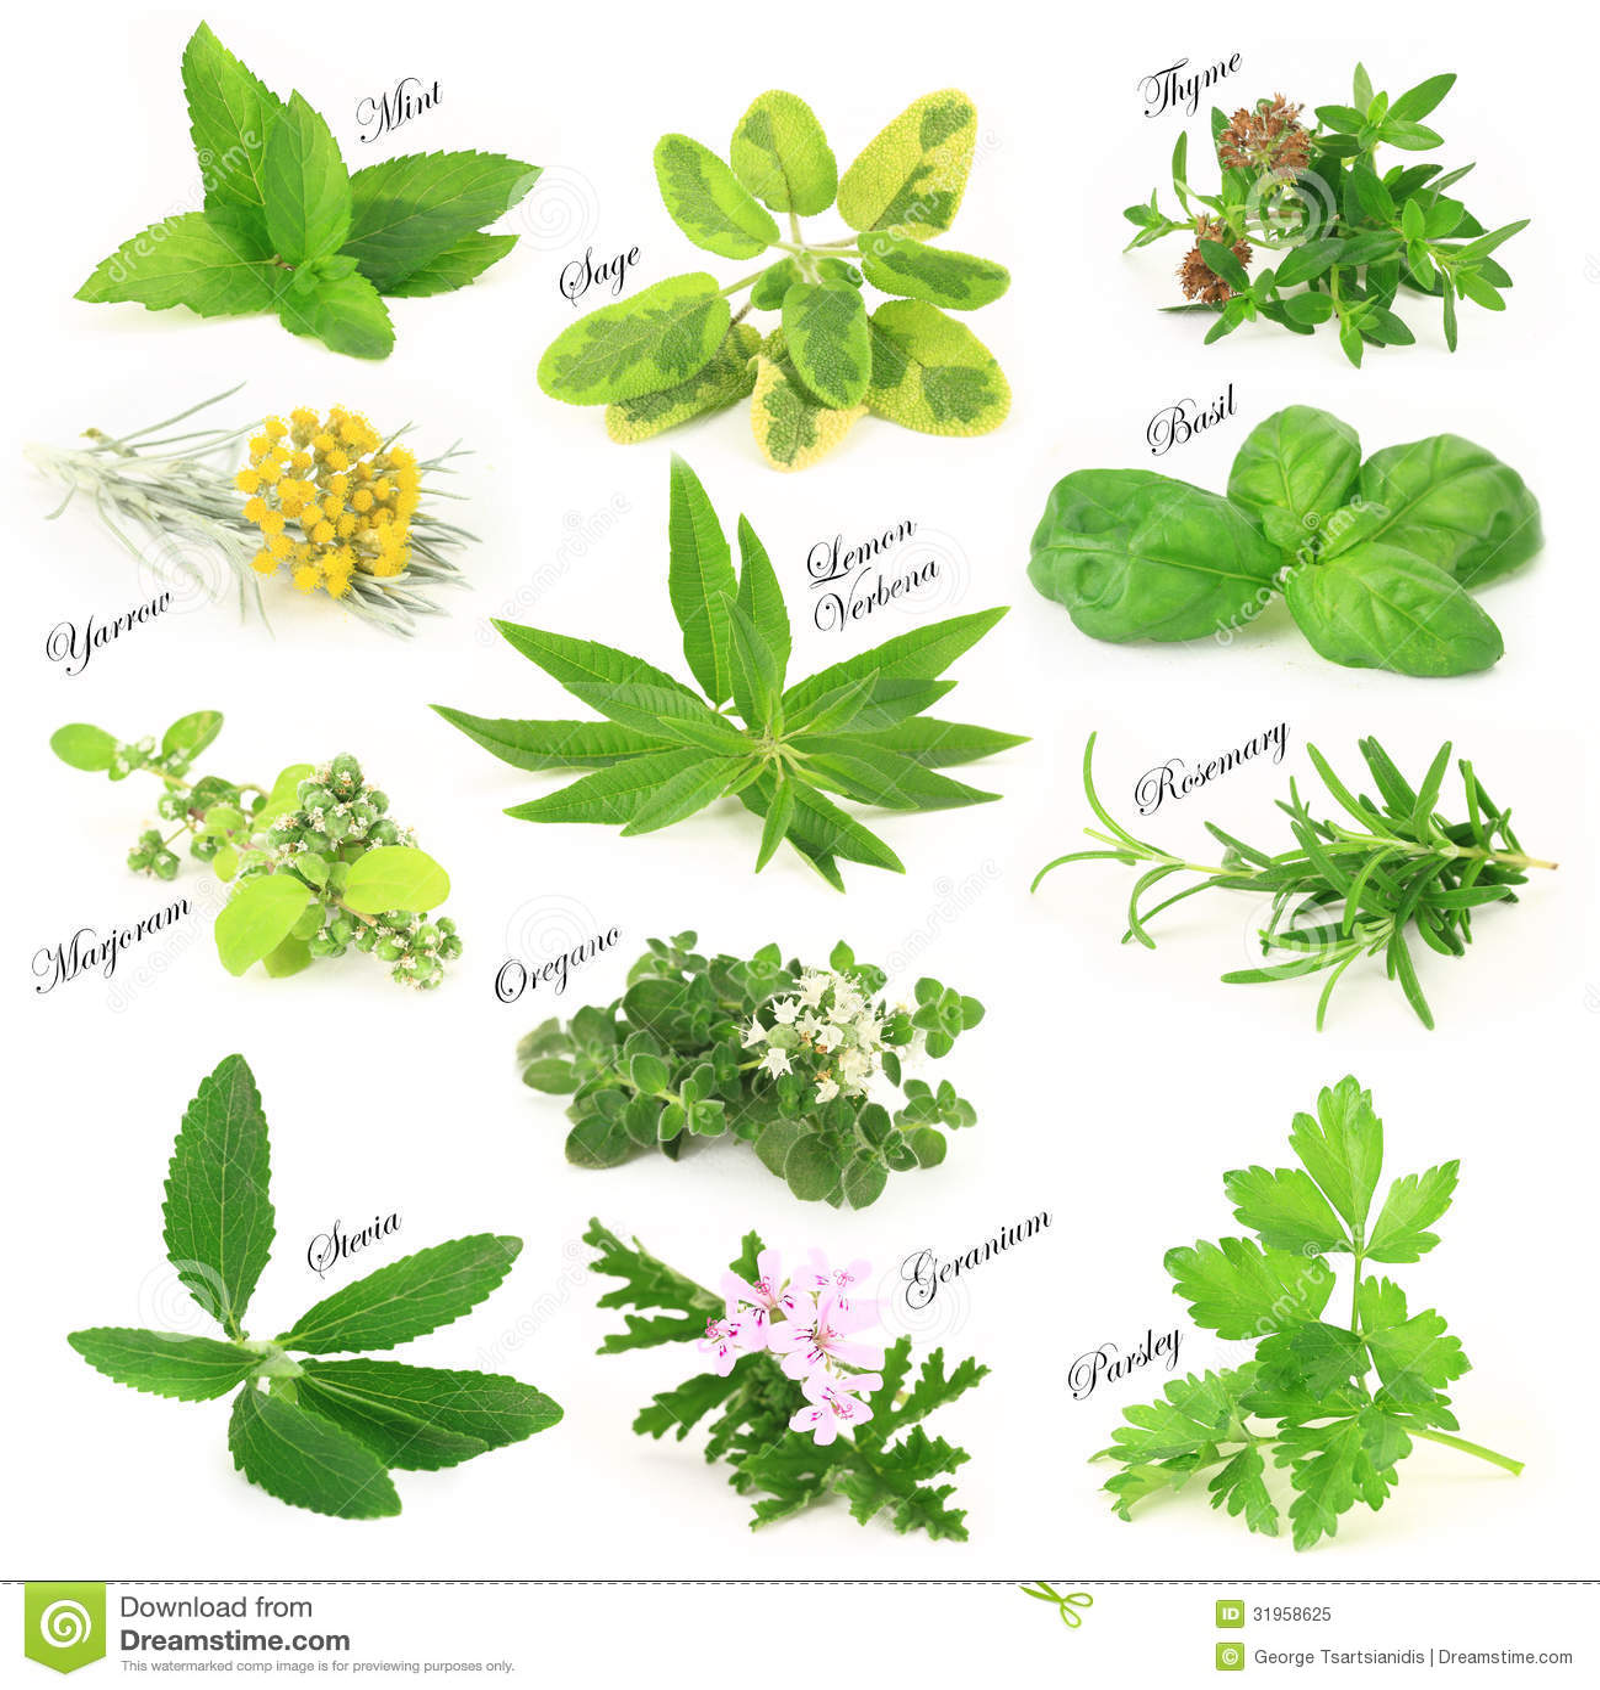 herbes aromatiques fra ches photo libre de droits image 31958625. Black Bedroom Furniture Sets. Home Design Ideas